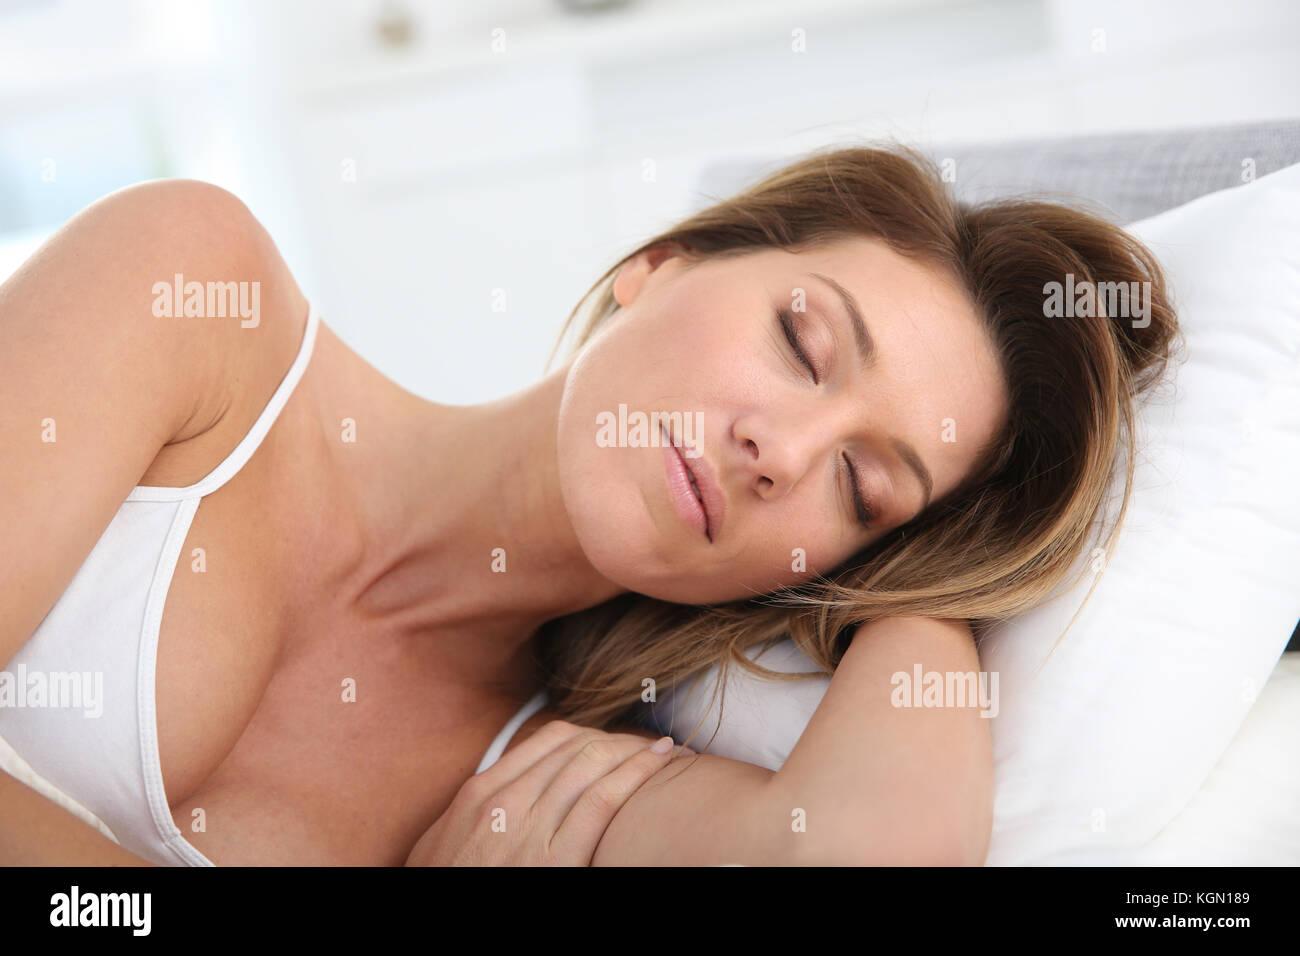 Closeup of woman asleep in bed - Stock Image